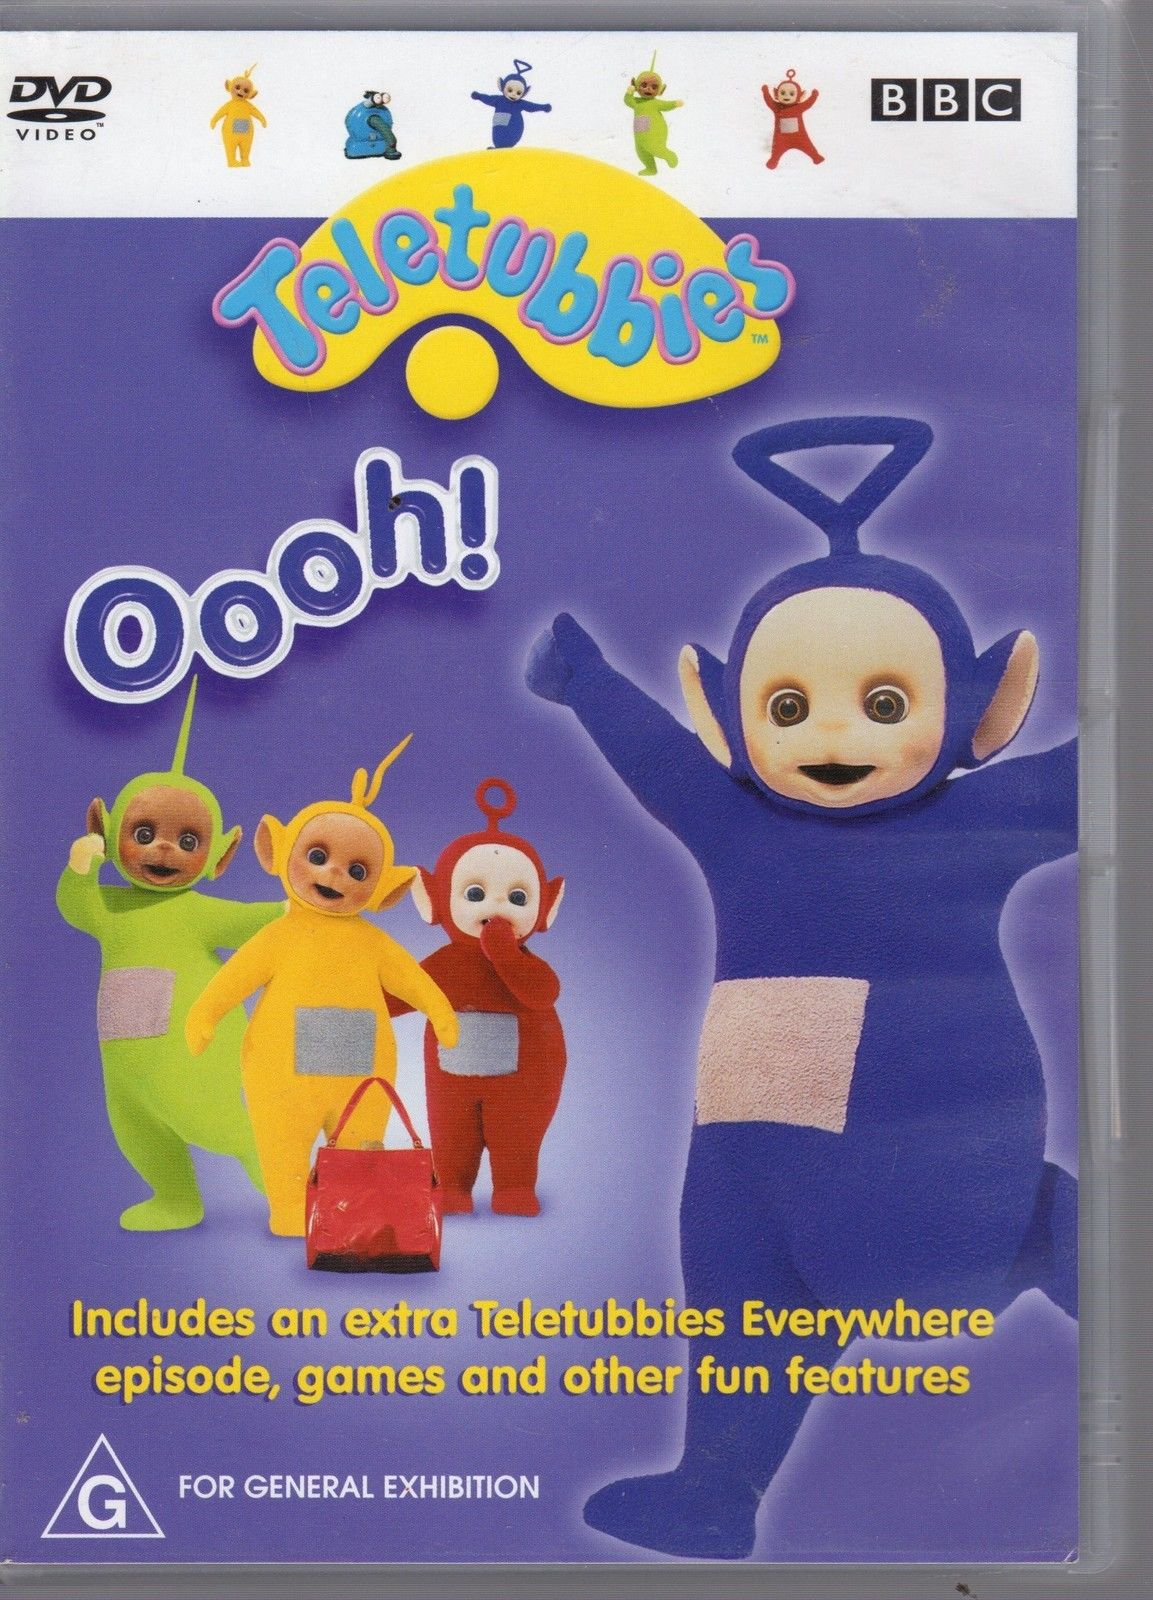 Oooh image - teletubbies oooh aus dvd | teletubbies wiki | fandom